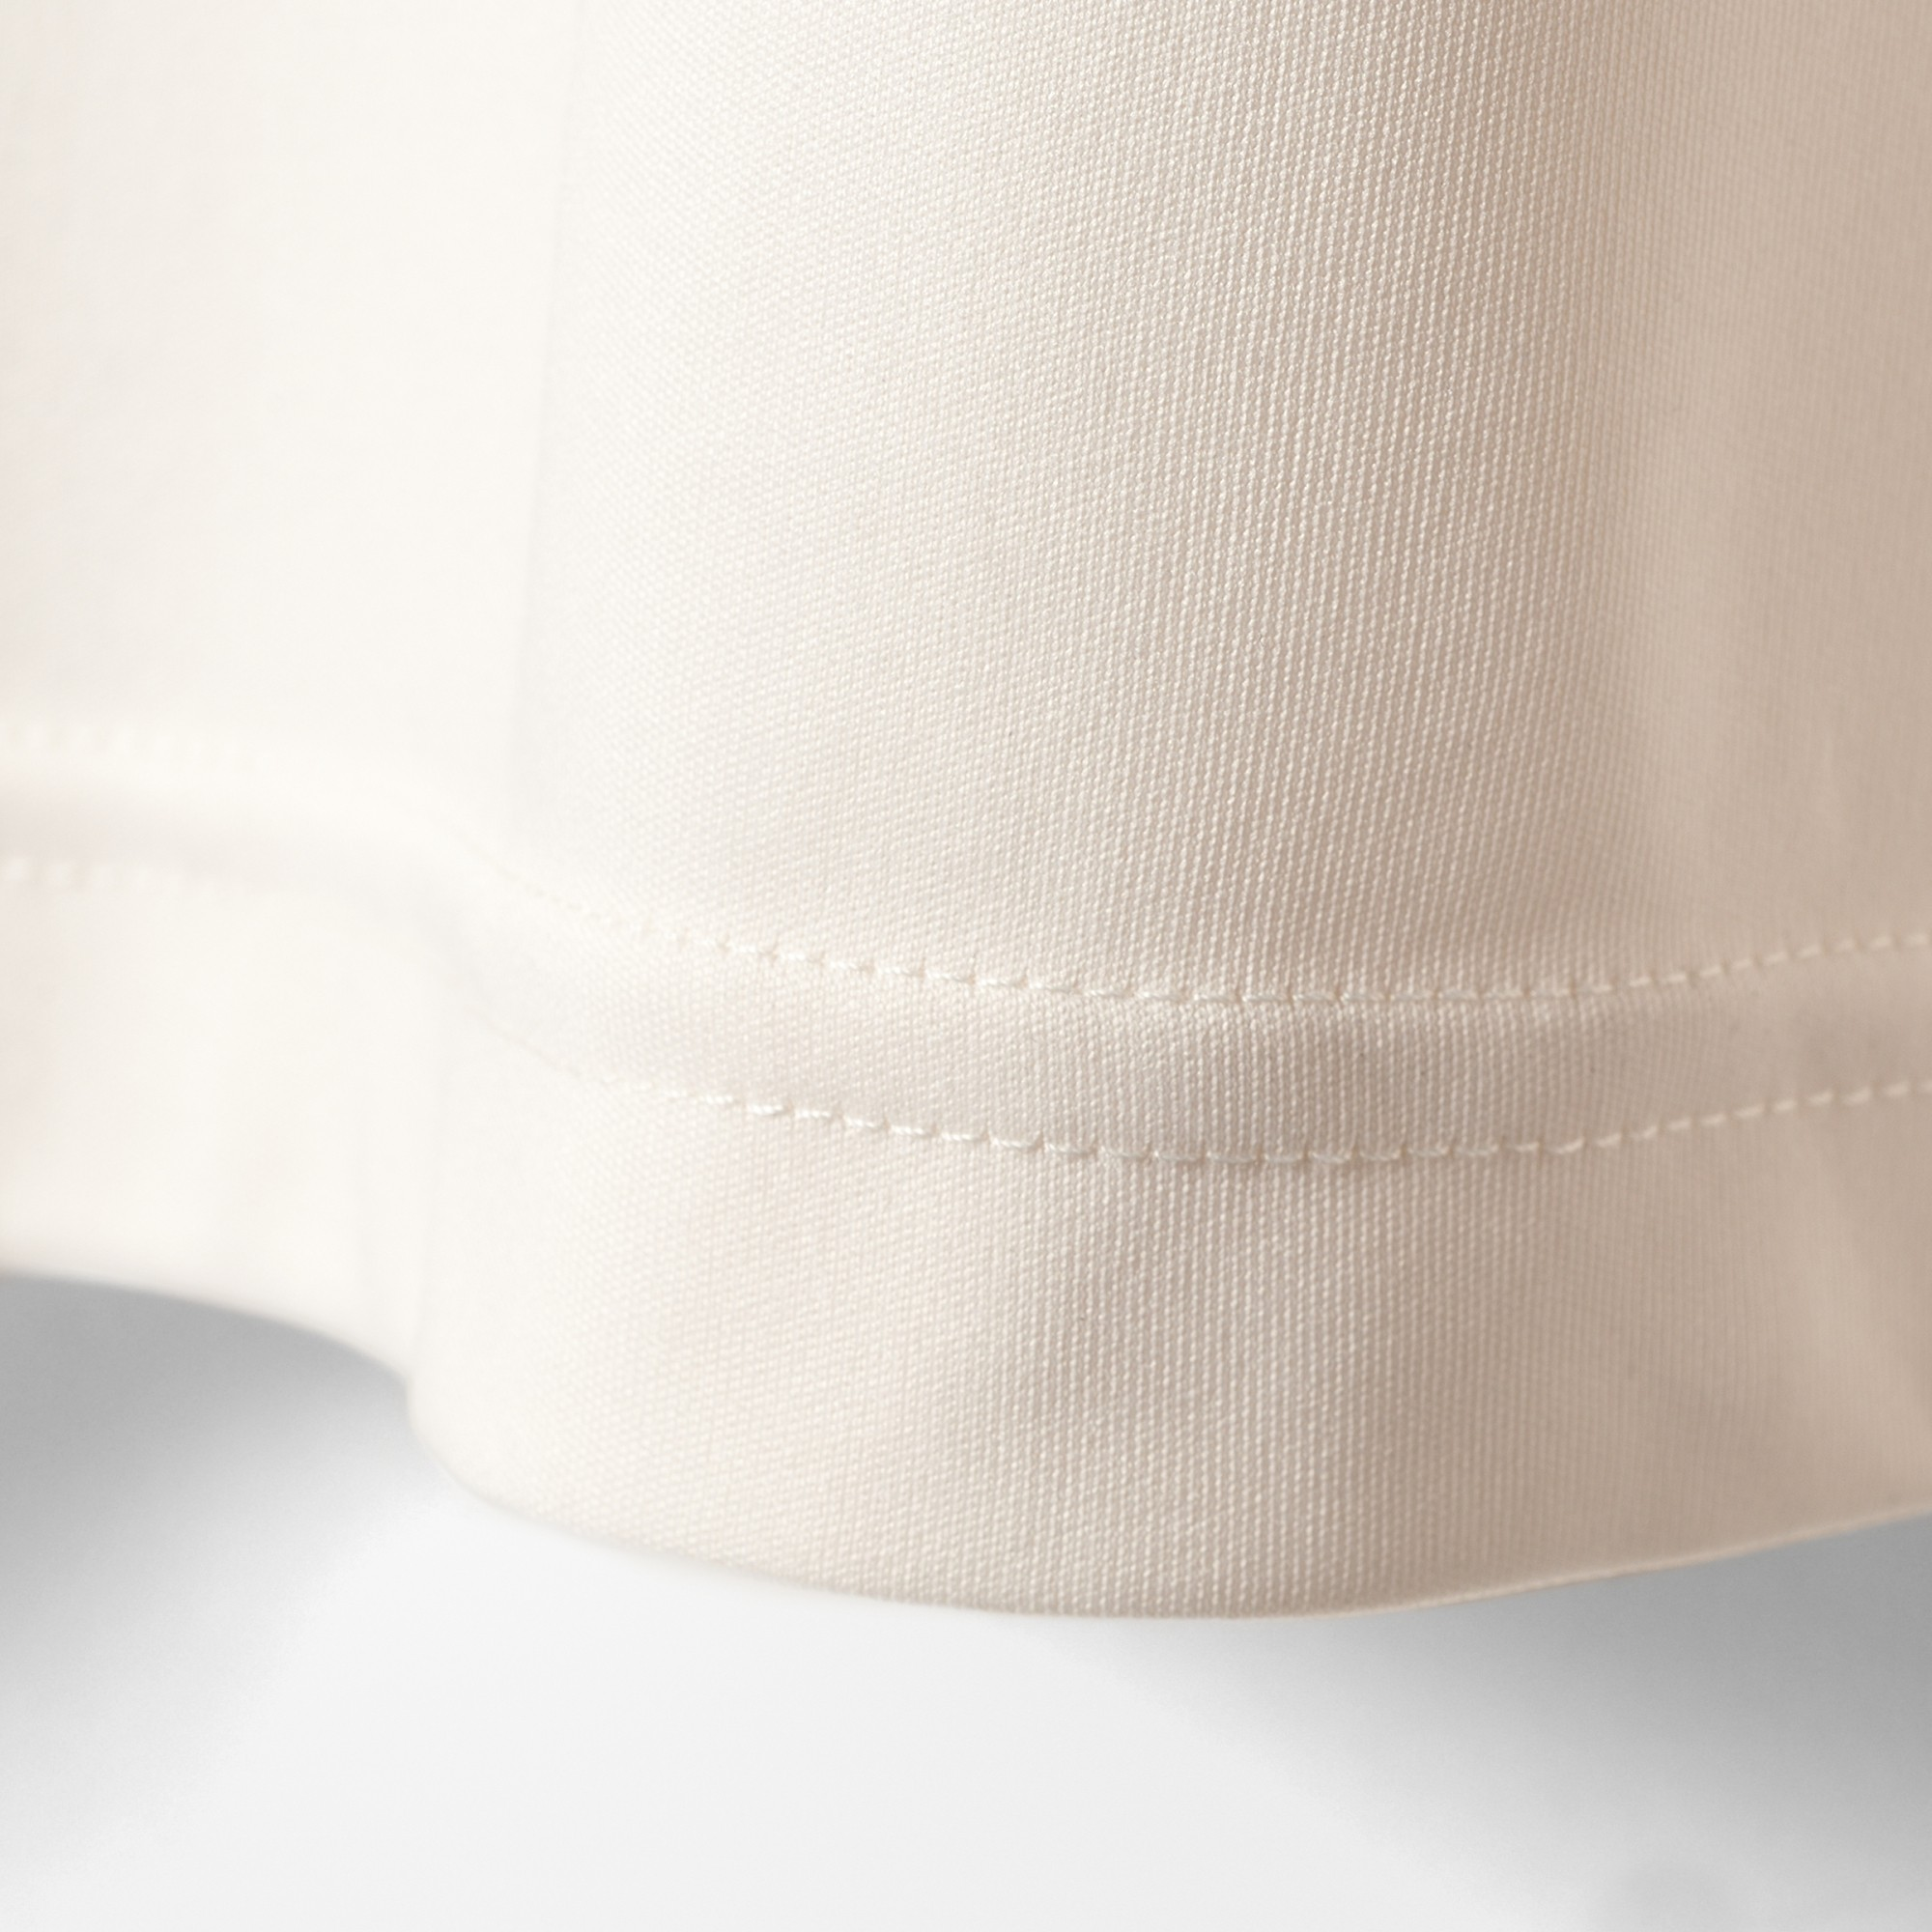 Adidas Howzat Short Sleeve Playing Shirt